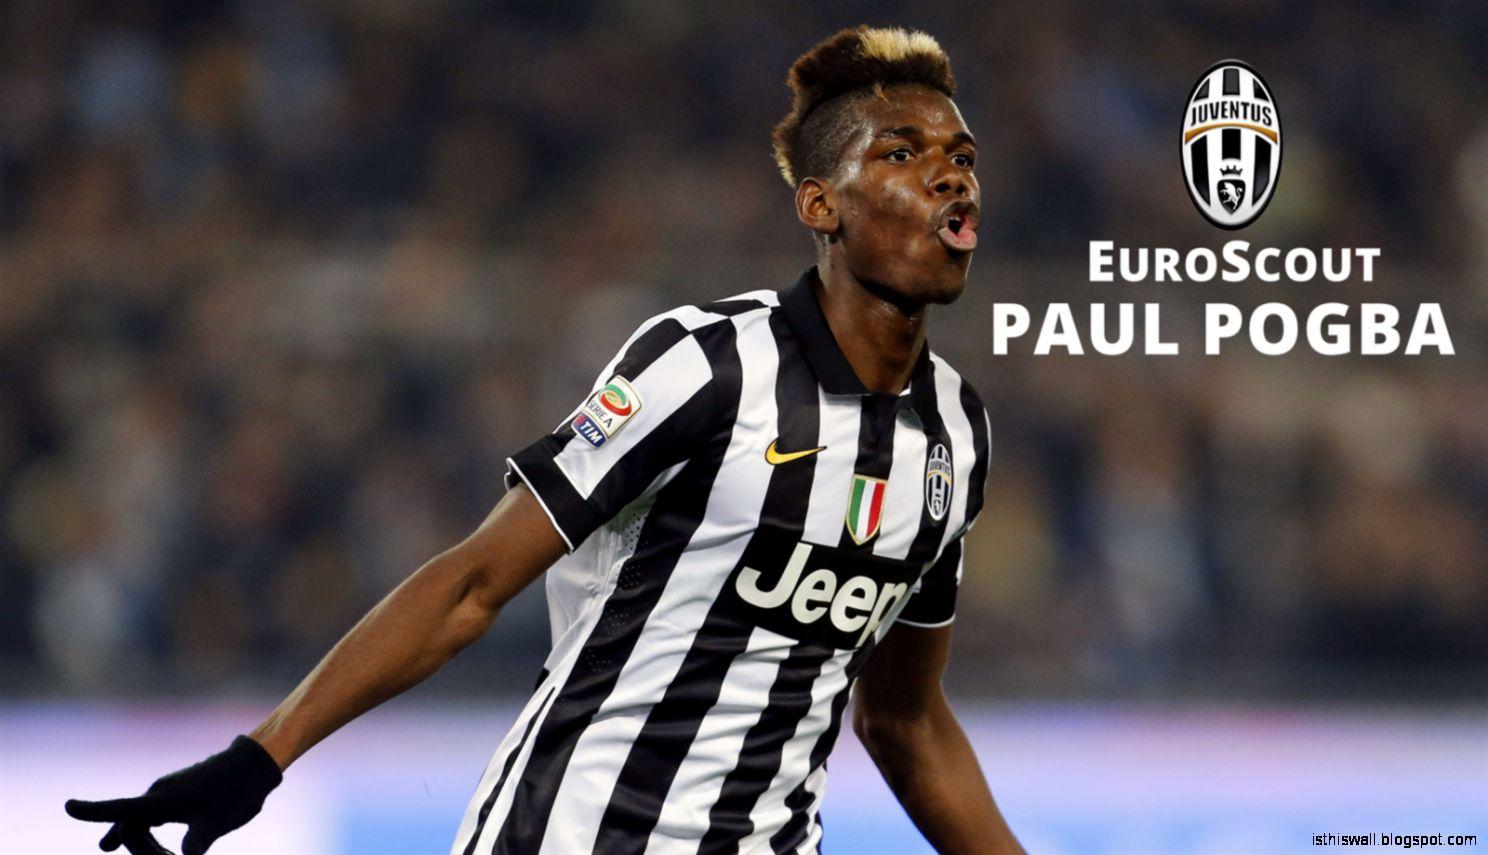 Paul Pogba Free Download Hd Wallpapers